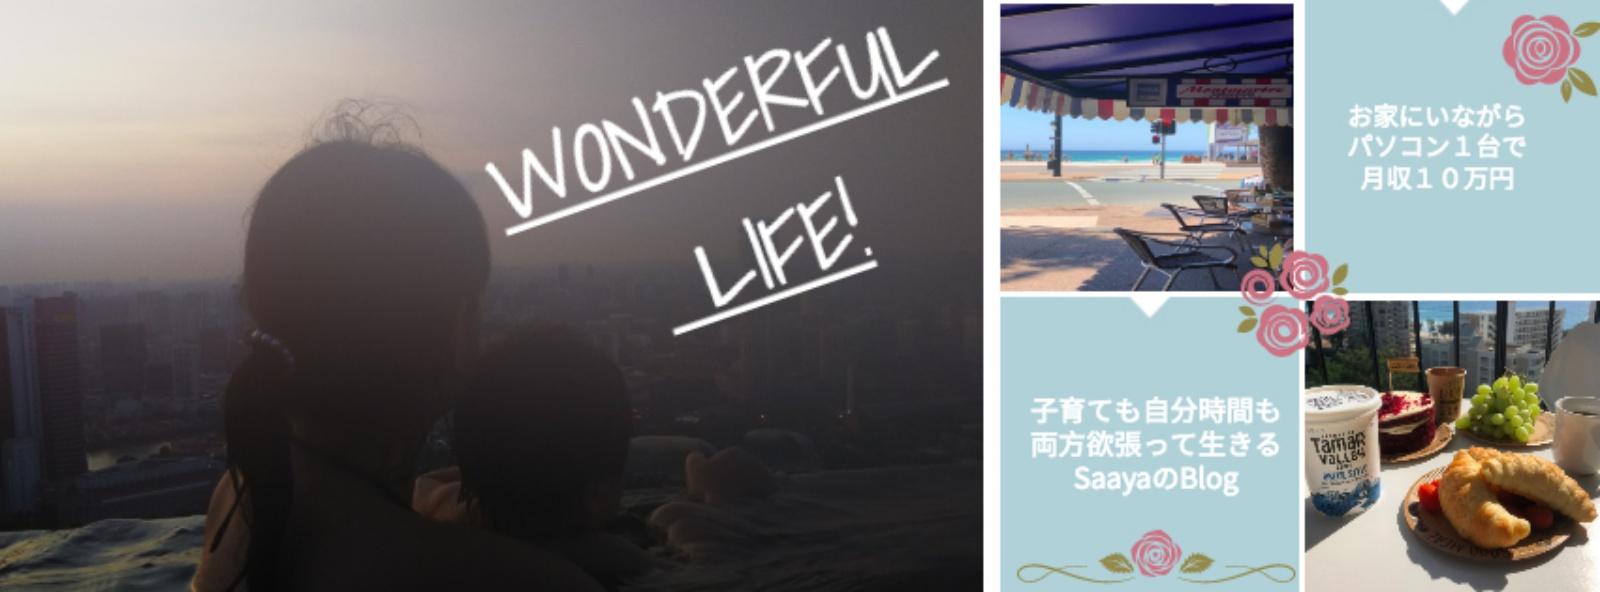 Wonderful Life!